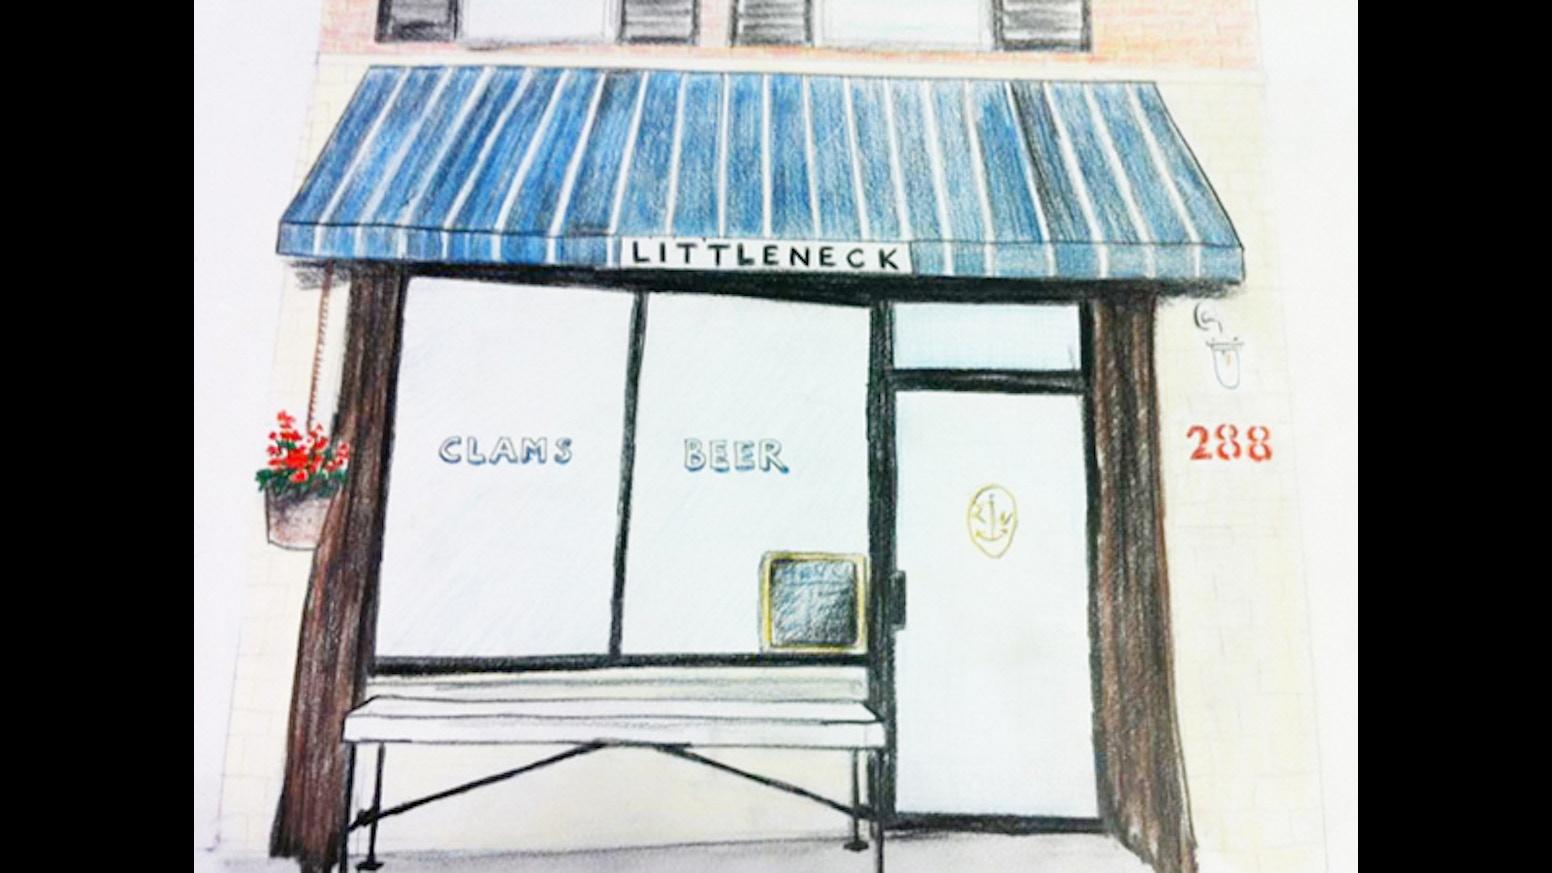 littleneck a clam shack coming soon to gowanus by littleneck littleneck a clam shack coming soon to gowanus